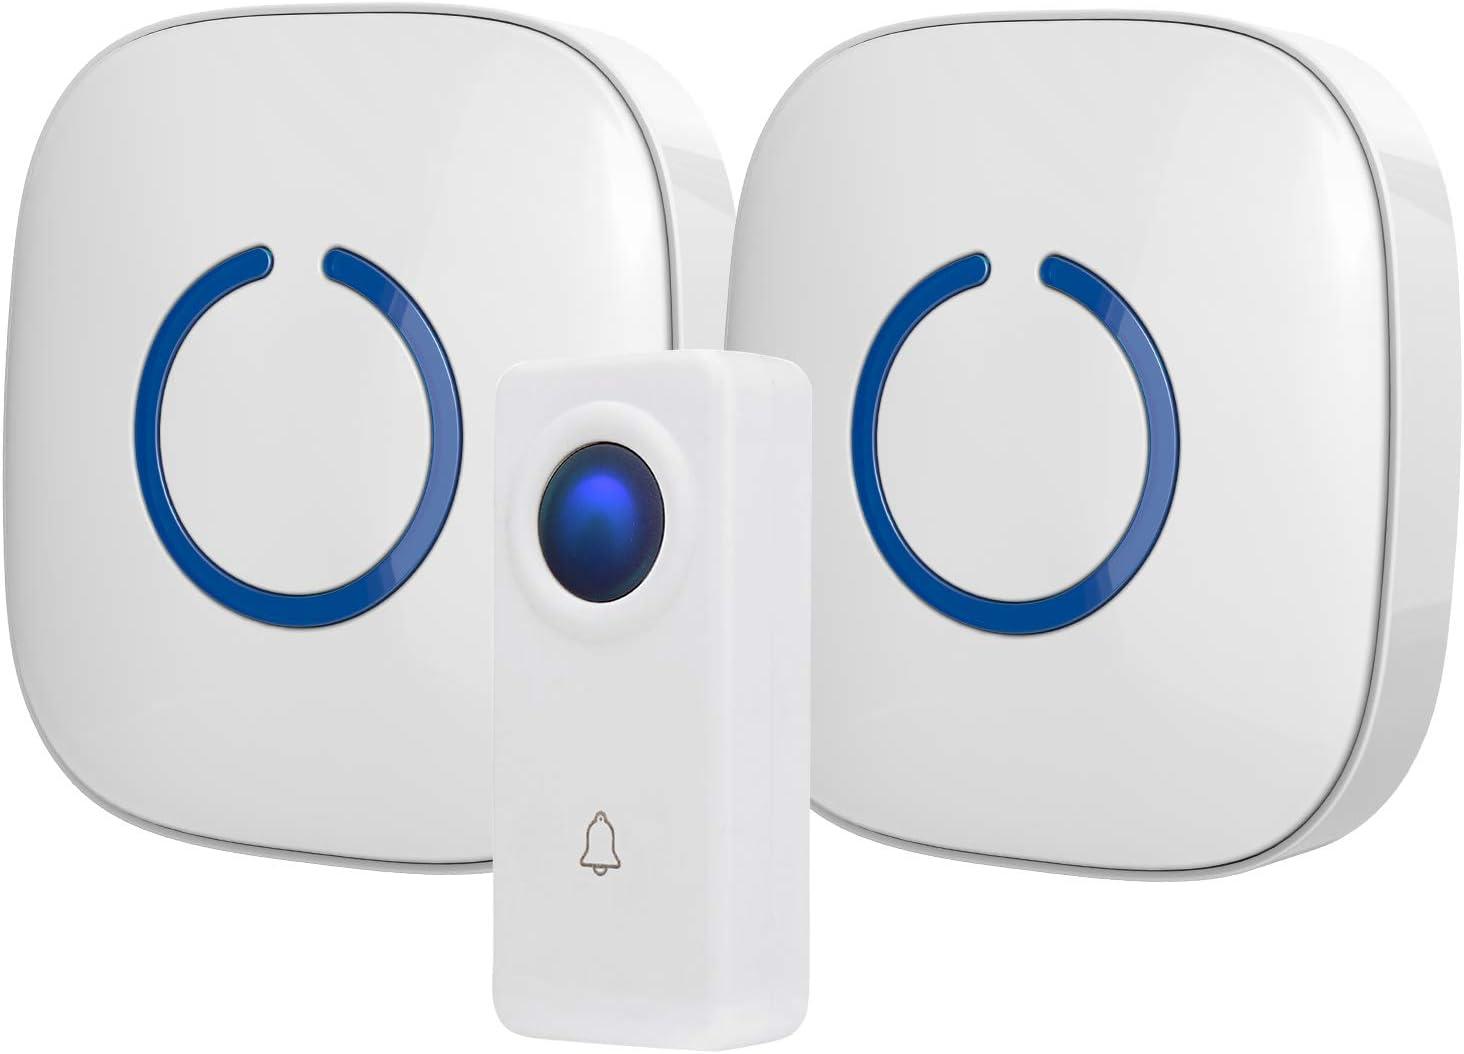 SadoTech White Wireless Doorbell Kit: Crosspoint Wireless Doorbells for Home with 1 Push Button Transmitter and 2 Receivers - Waterproof, Long Range Wireless Door Bell - Battery Operated Door Bells